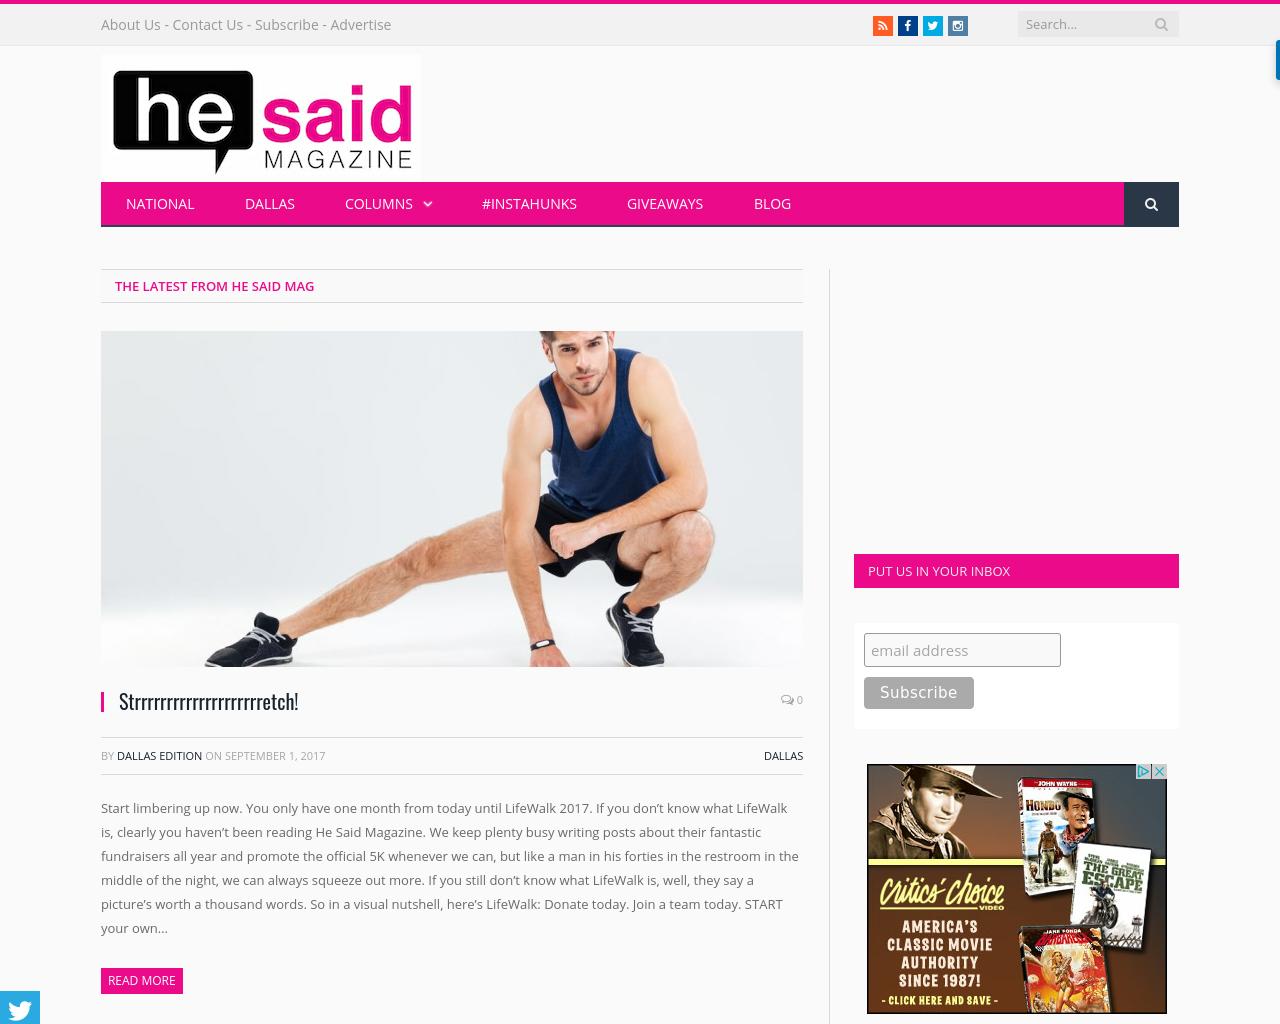 He-Said-Magazine-Advertising-Reviews-Pricing